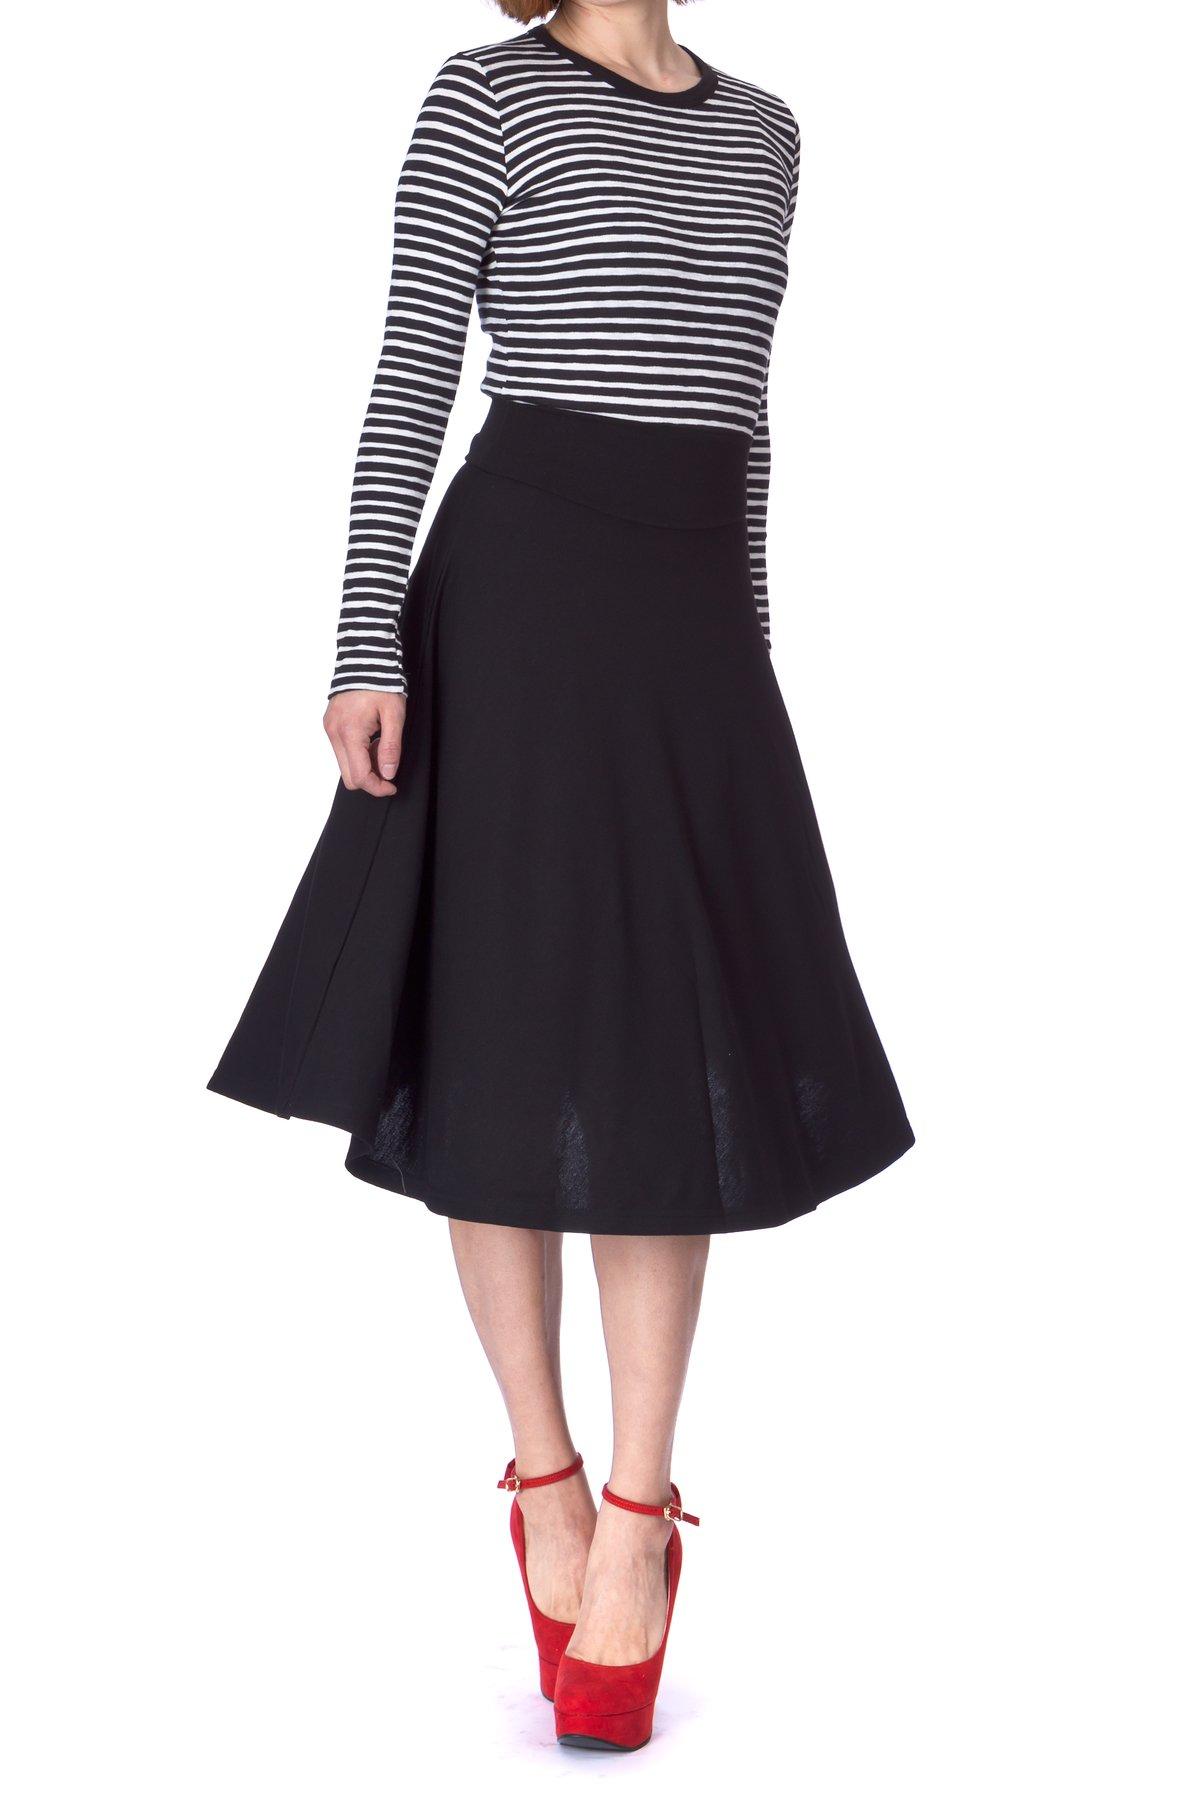 3c3554104b Get Quotations · Dani's Choice Stretch High Waist A-line Flared Long Midi  Skirt